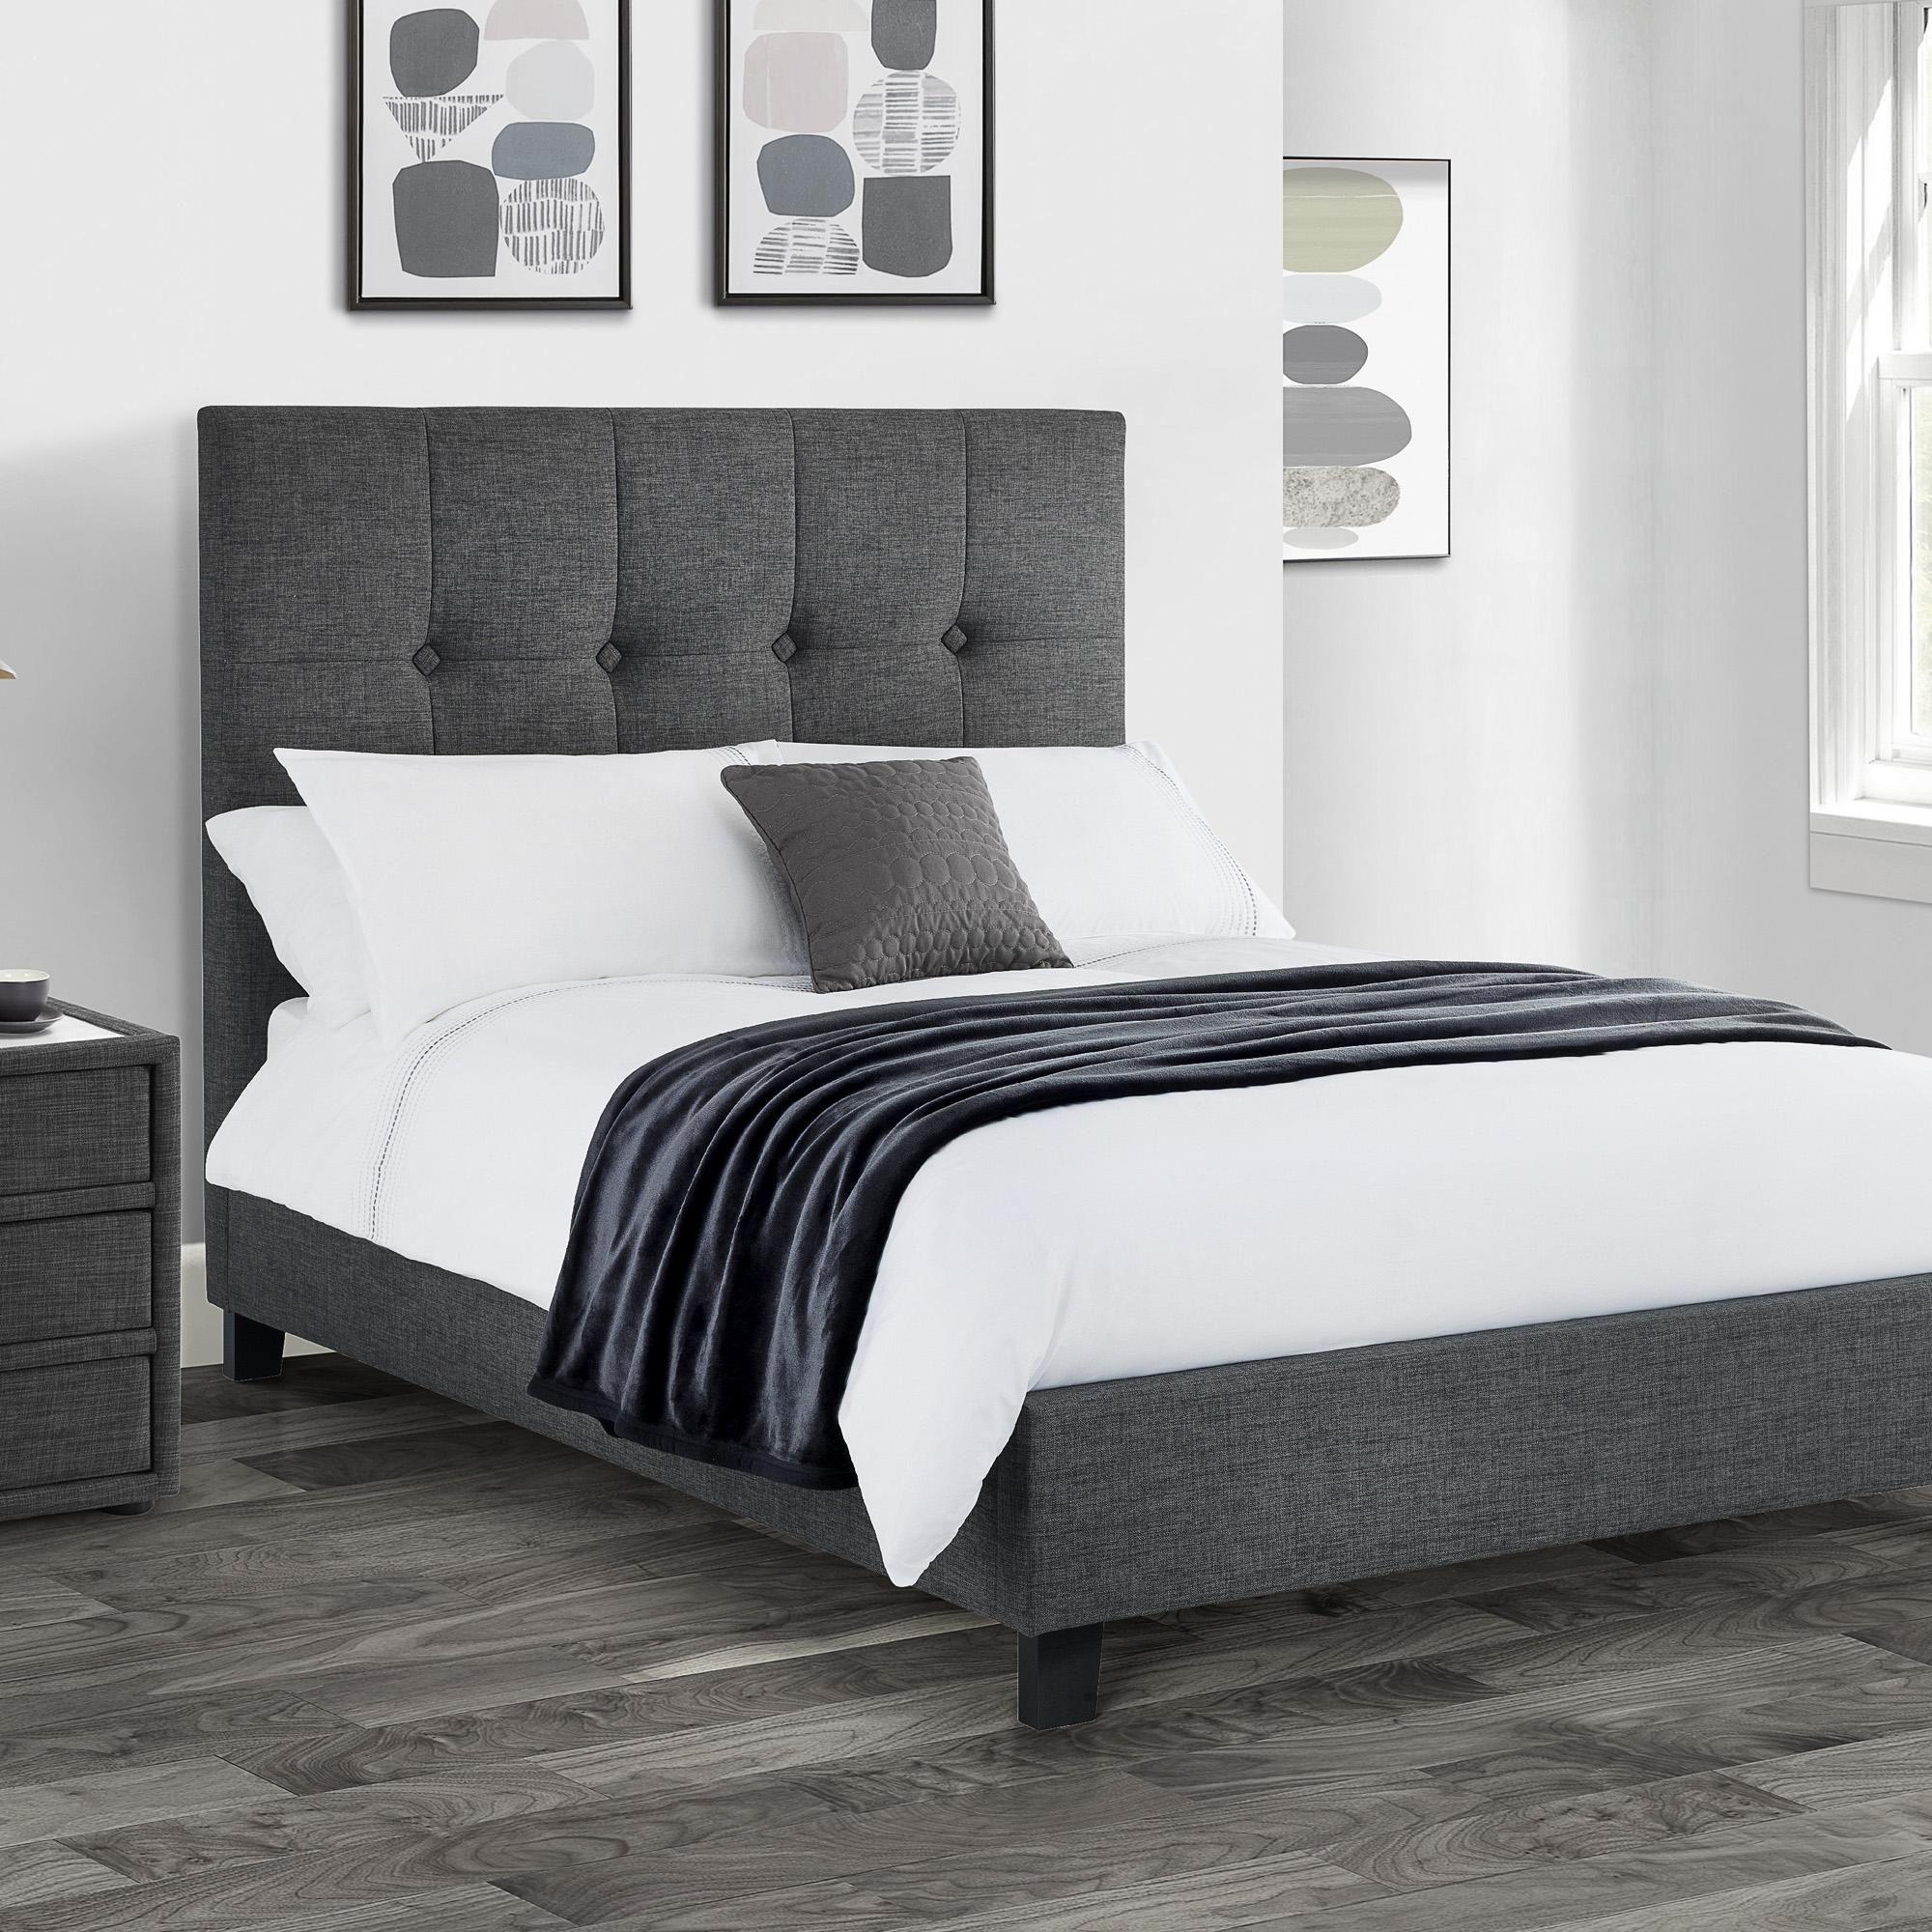 Sorrento Slate Grey Upholstered Bed Frame In 2020 Upholstered